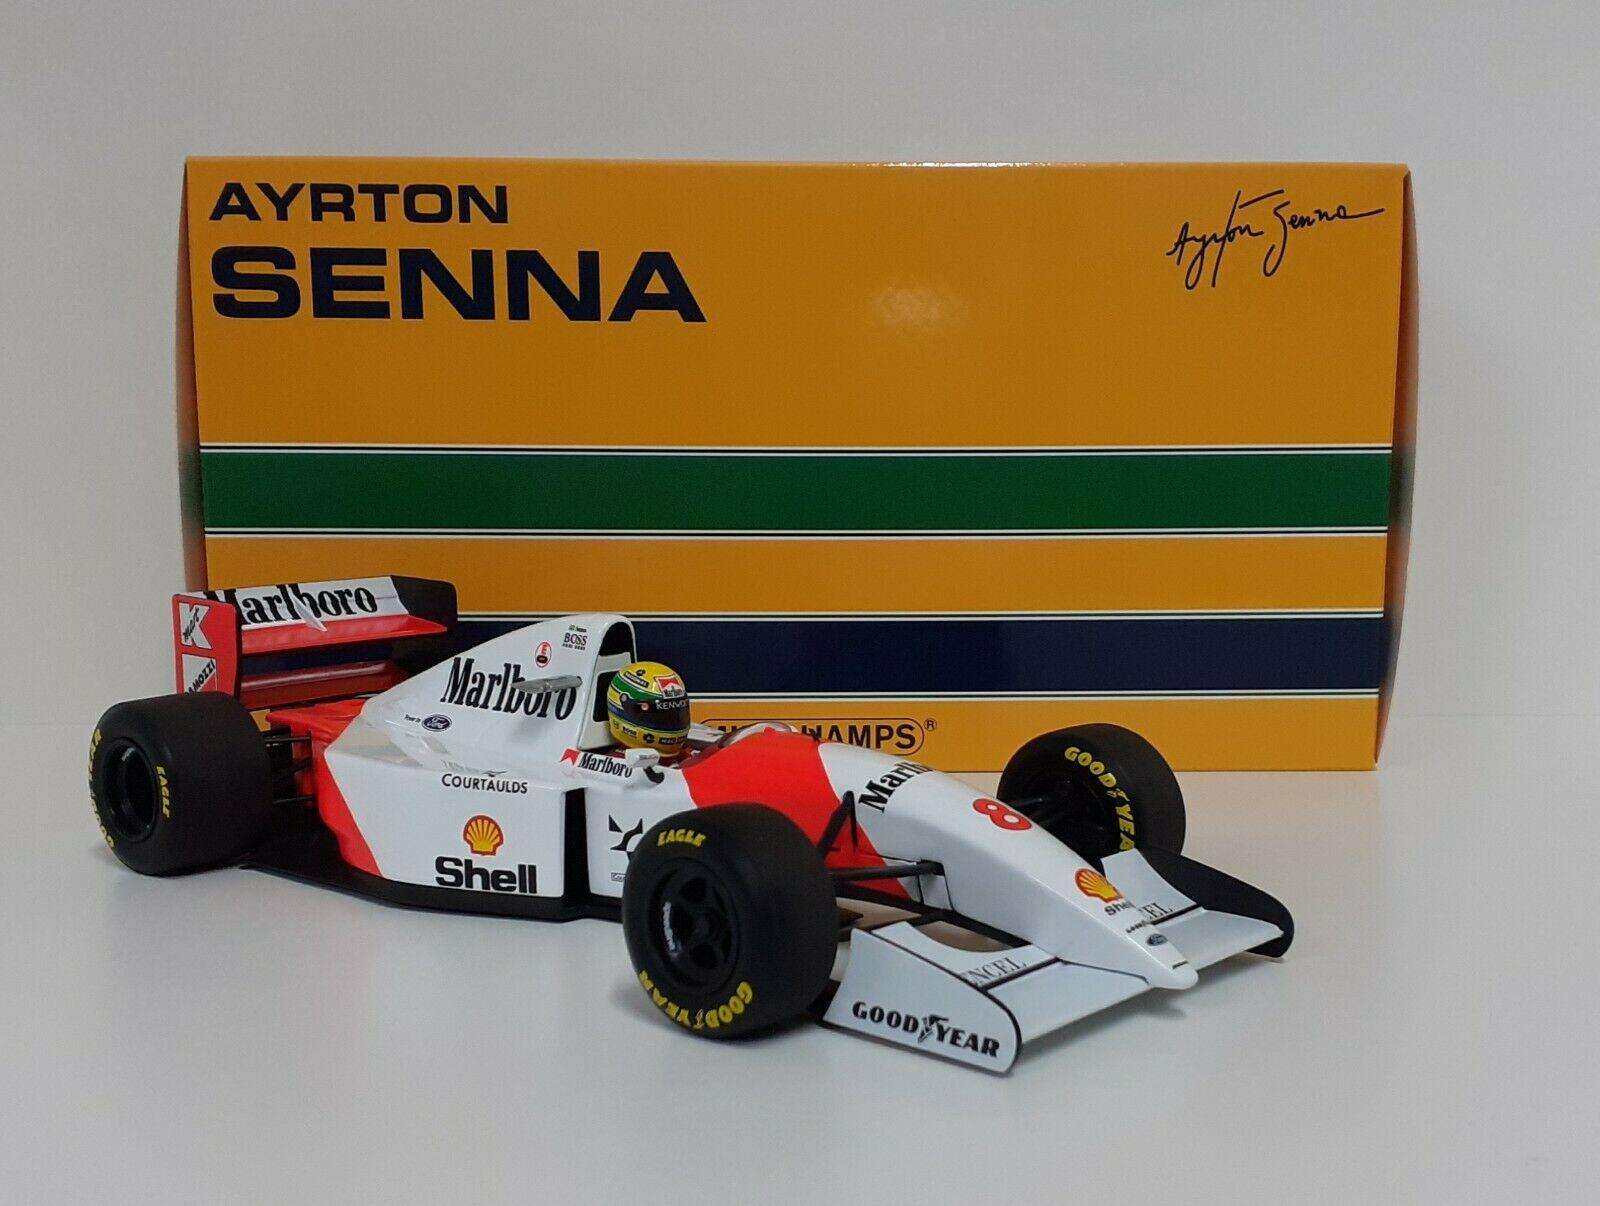 MINICHAMPS 1/18 AYRTON SENNA MODELLO DIECAST AUTO F1 MCLAREN FORD GIAPPONE 1993